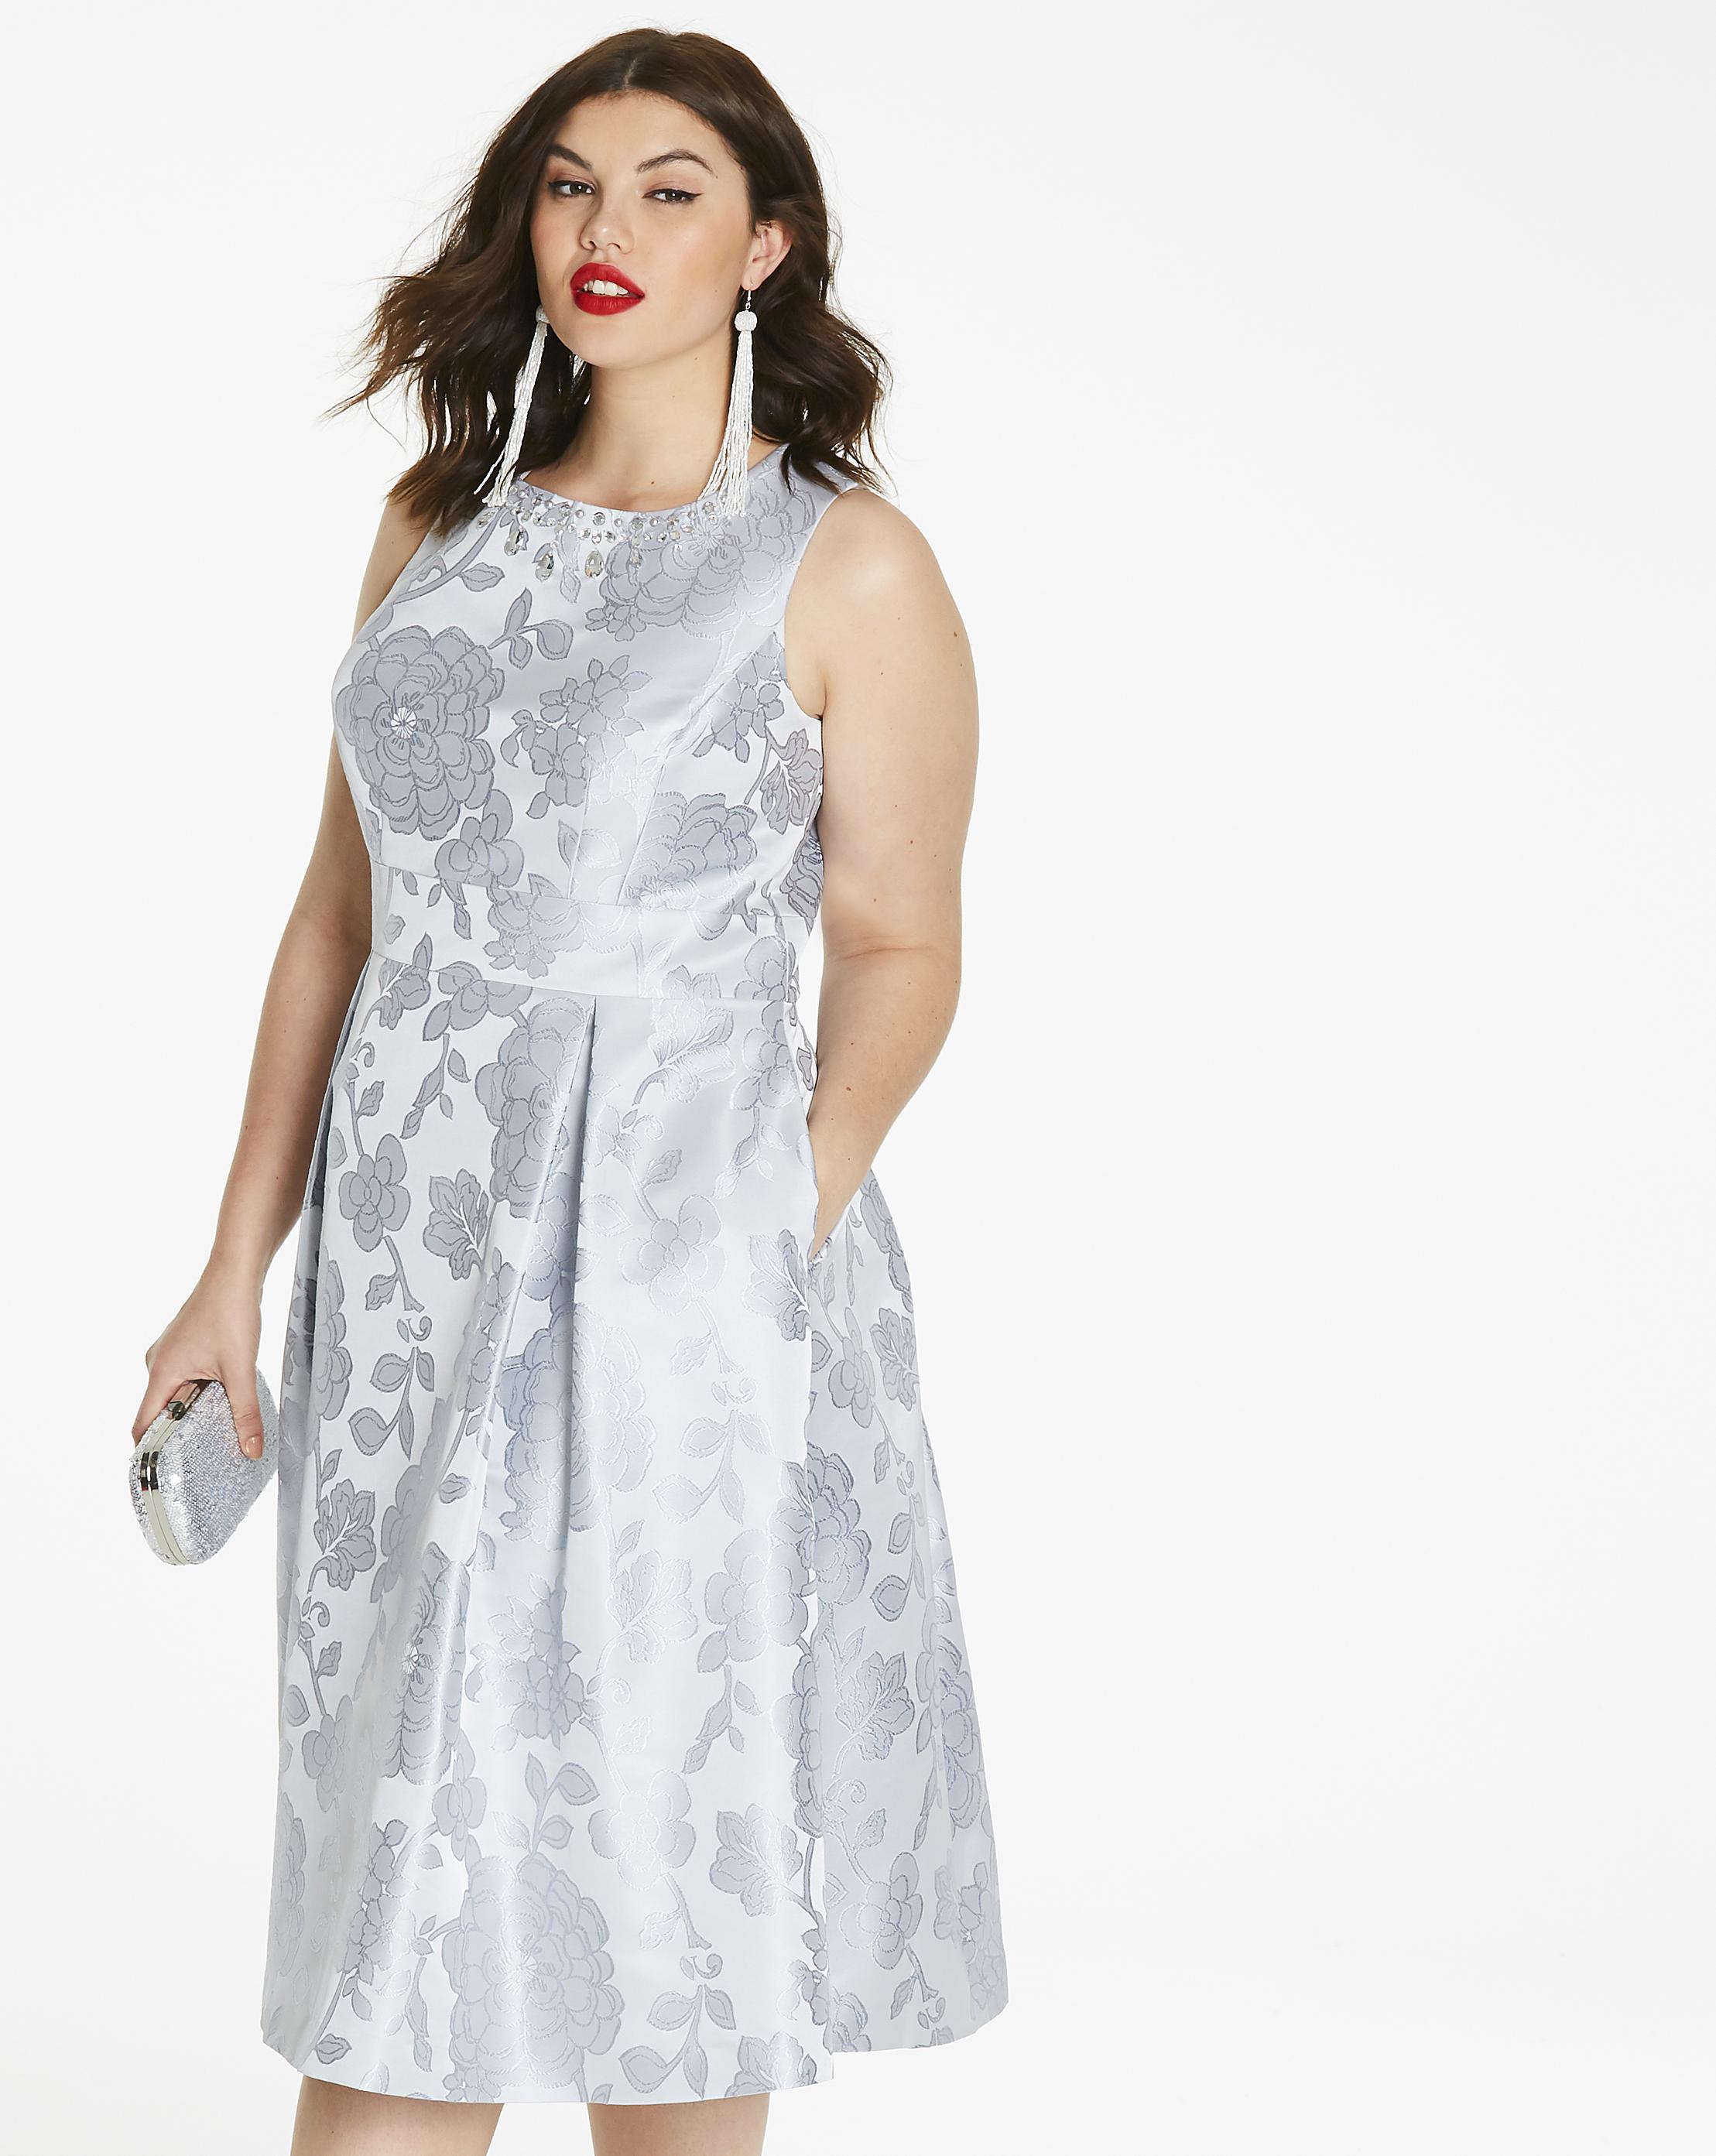 Lyst - Simply Be Joanna Hope Jacquard Prom Dress in Metallic